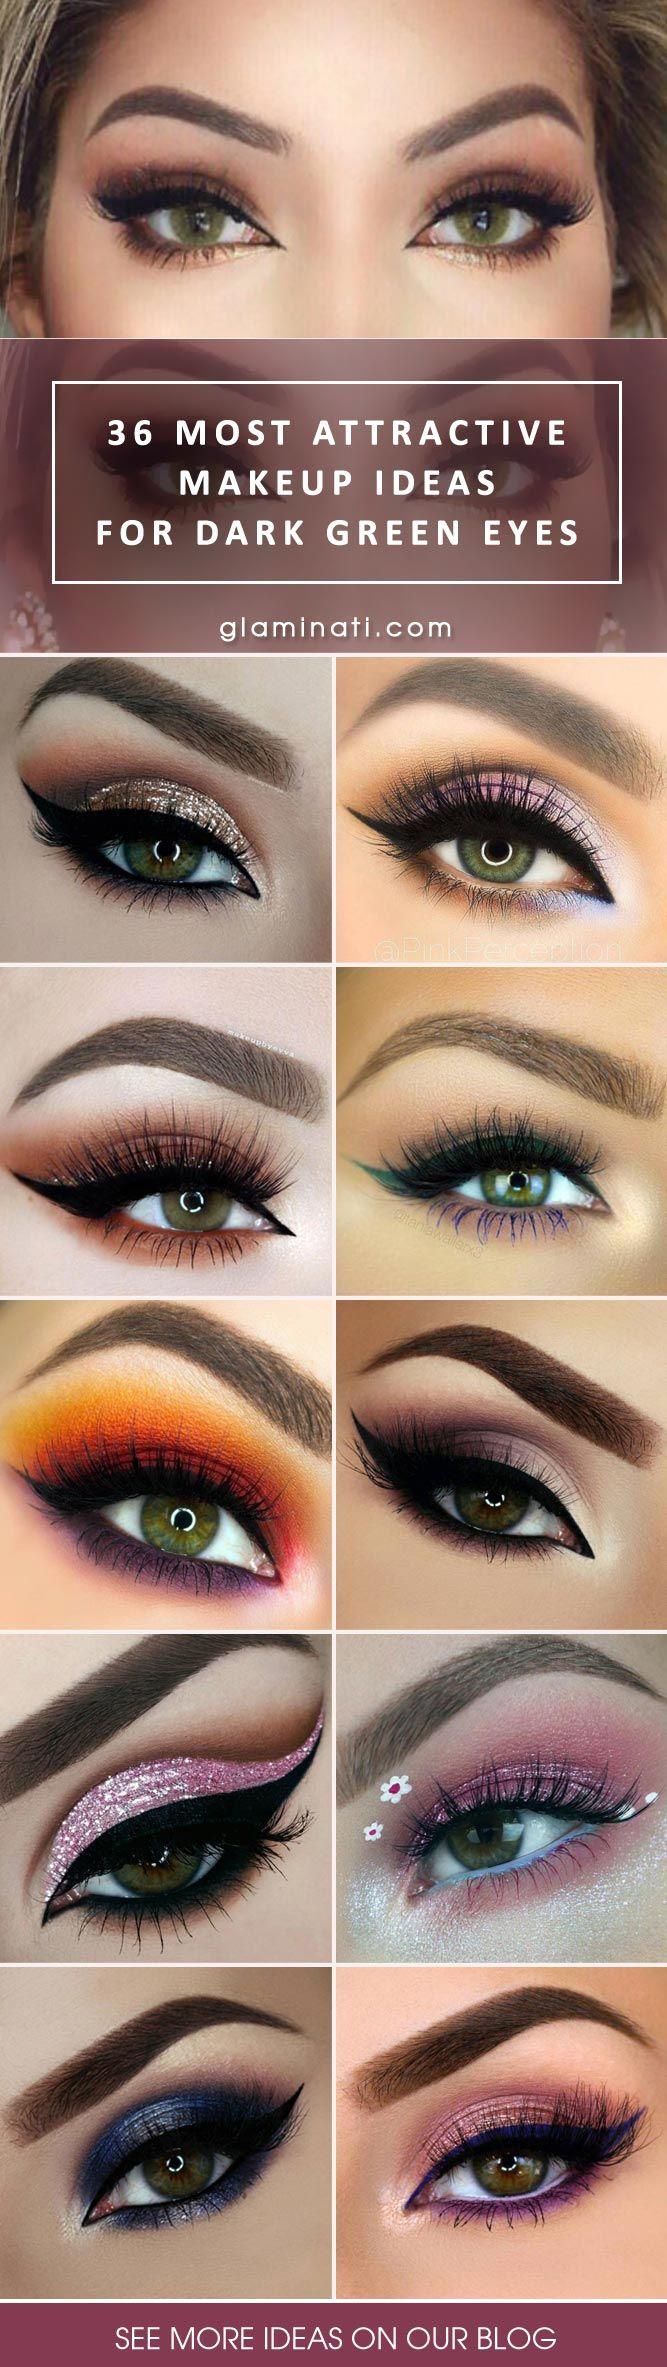 green eye makeup for dark skin | saubhaya makeup